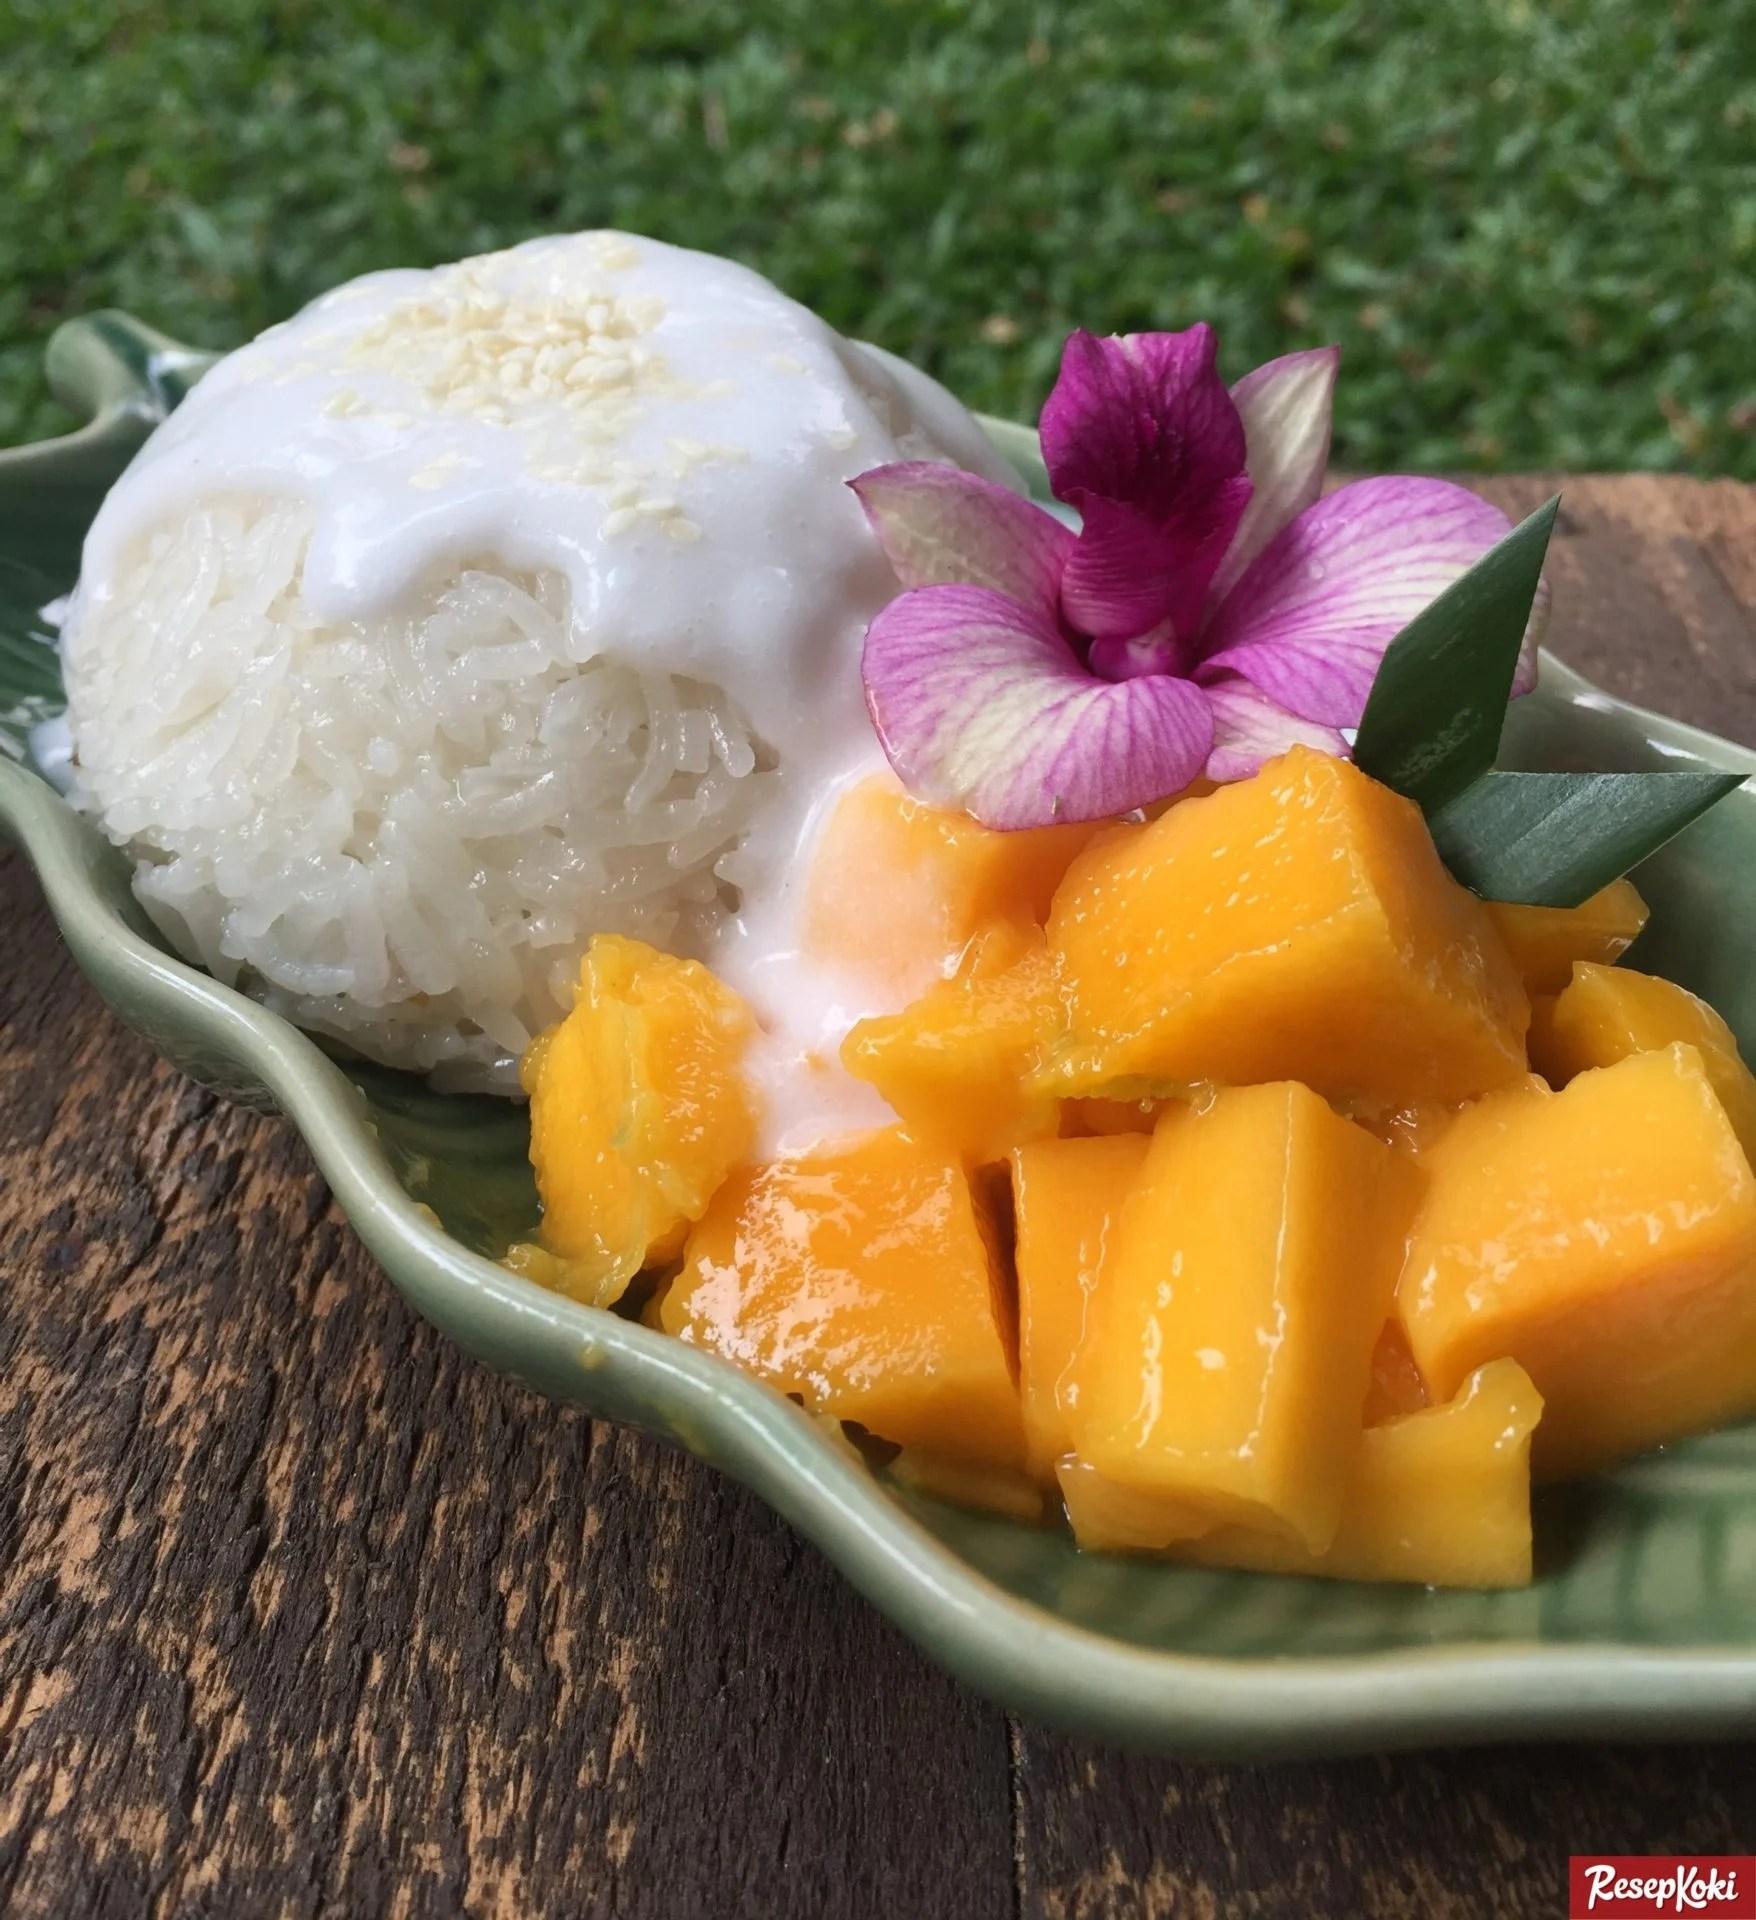 Mango Sticky Rice Jadi Street Food di Thailand yang Pertama Dicoba. Foto: resepkoki.id